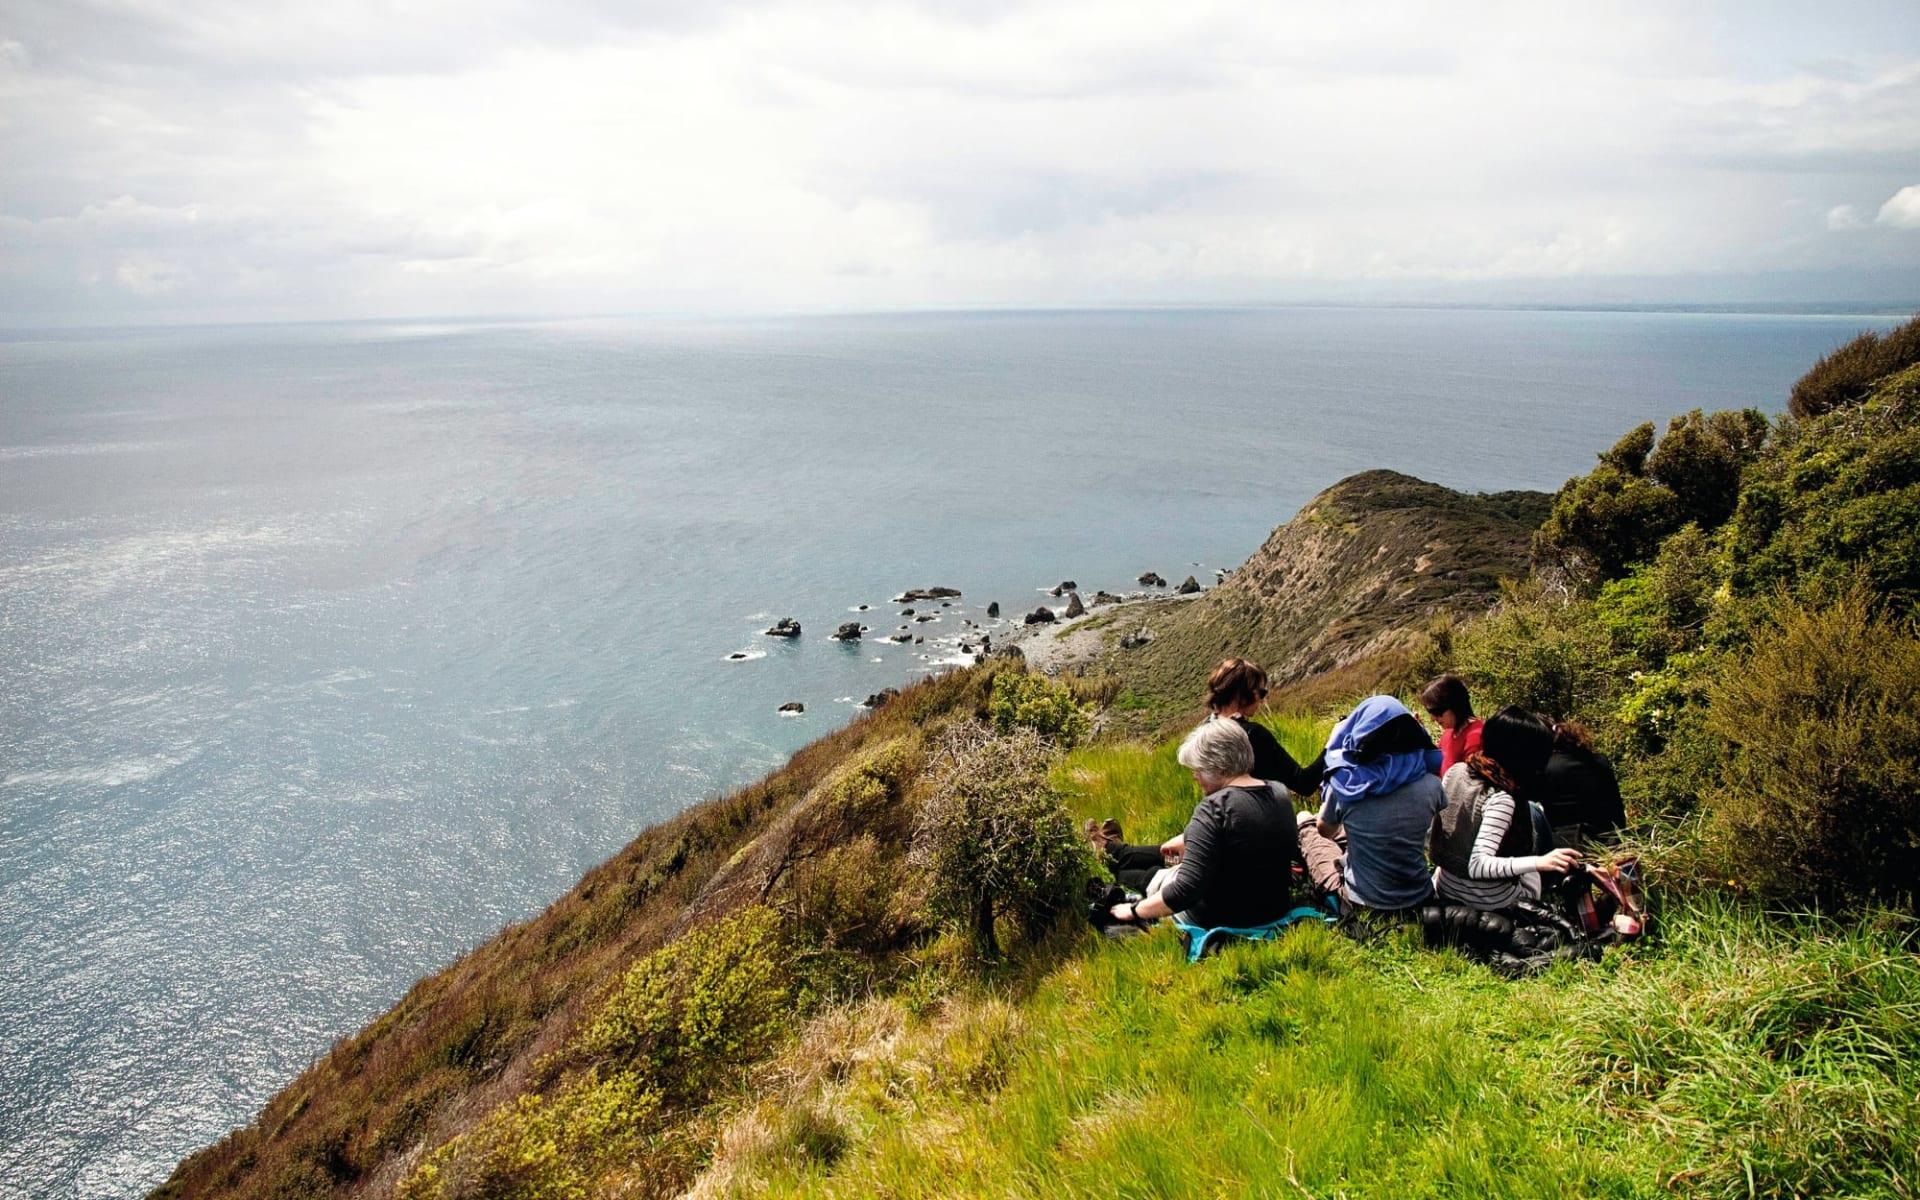 Kapiti Island Nature Tours:  Natur Kapiti Island Nature Tours Kapiti Island Neuseeland - Blick auf Gruppe auf einer Klippe 2017